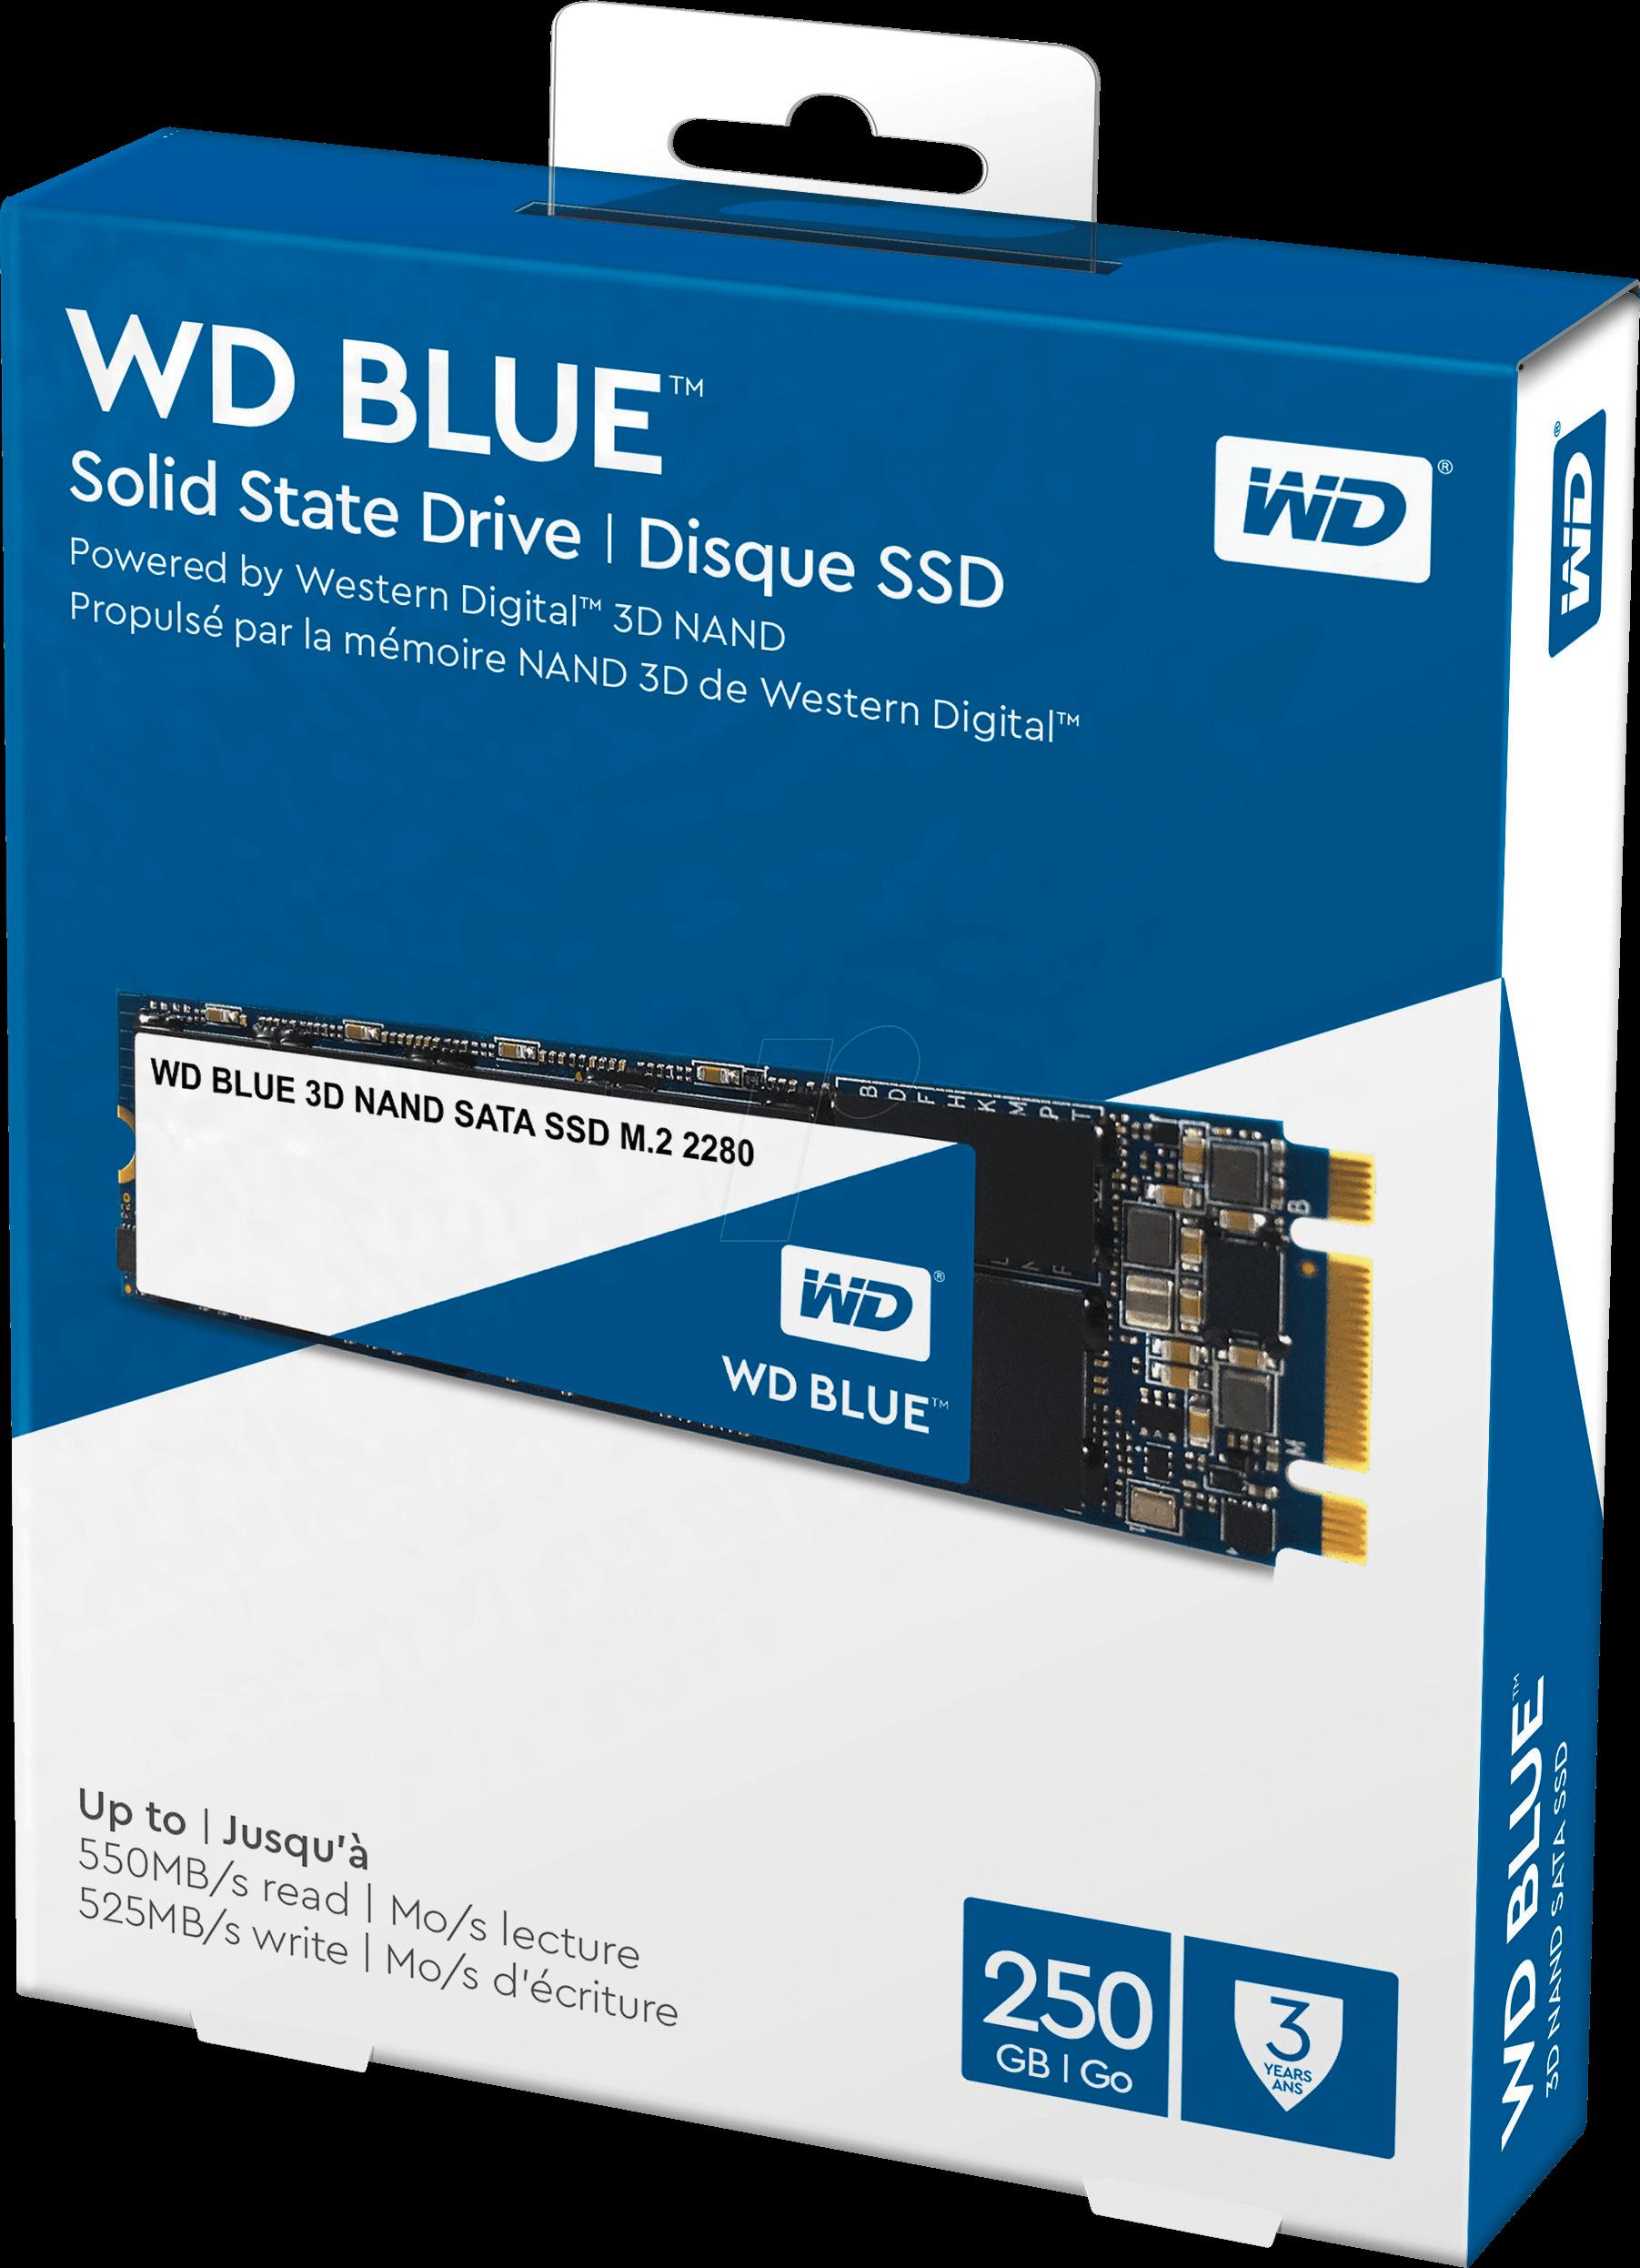 SSD WD BLUE NAND 250GB M.2 NOVE